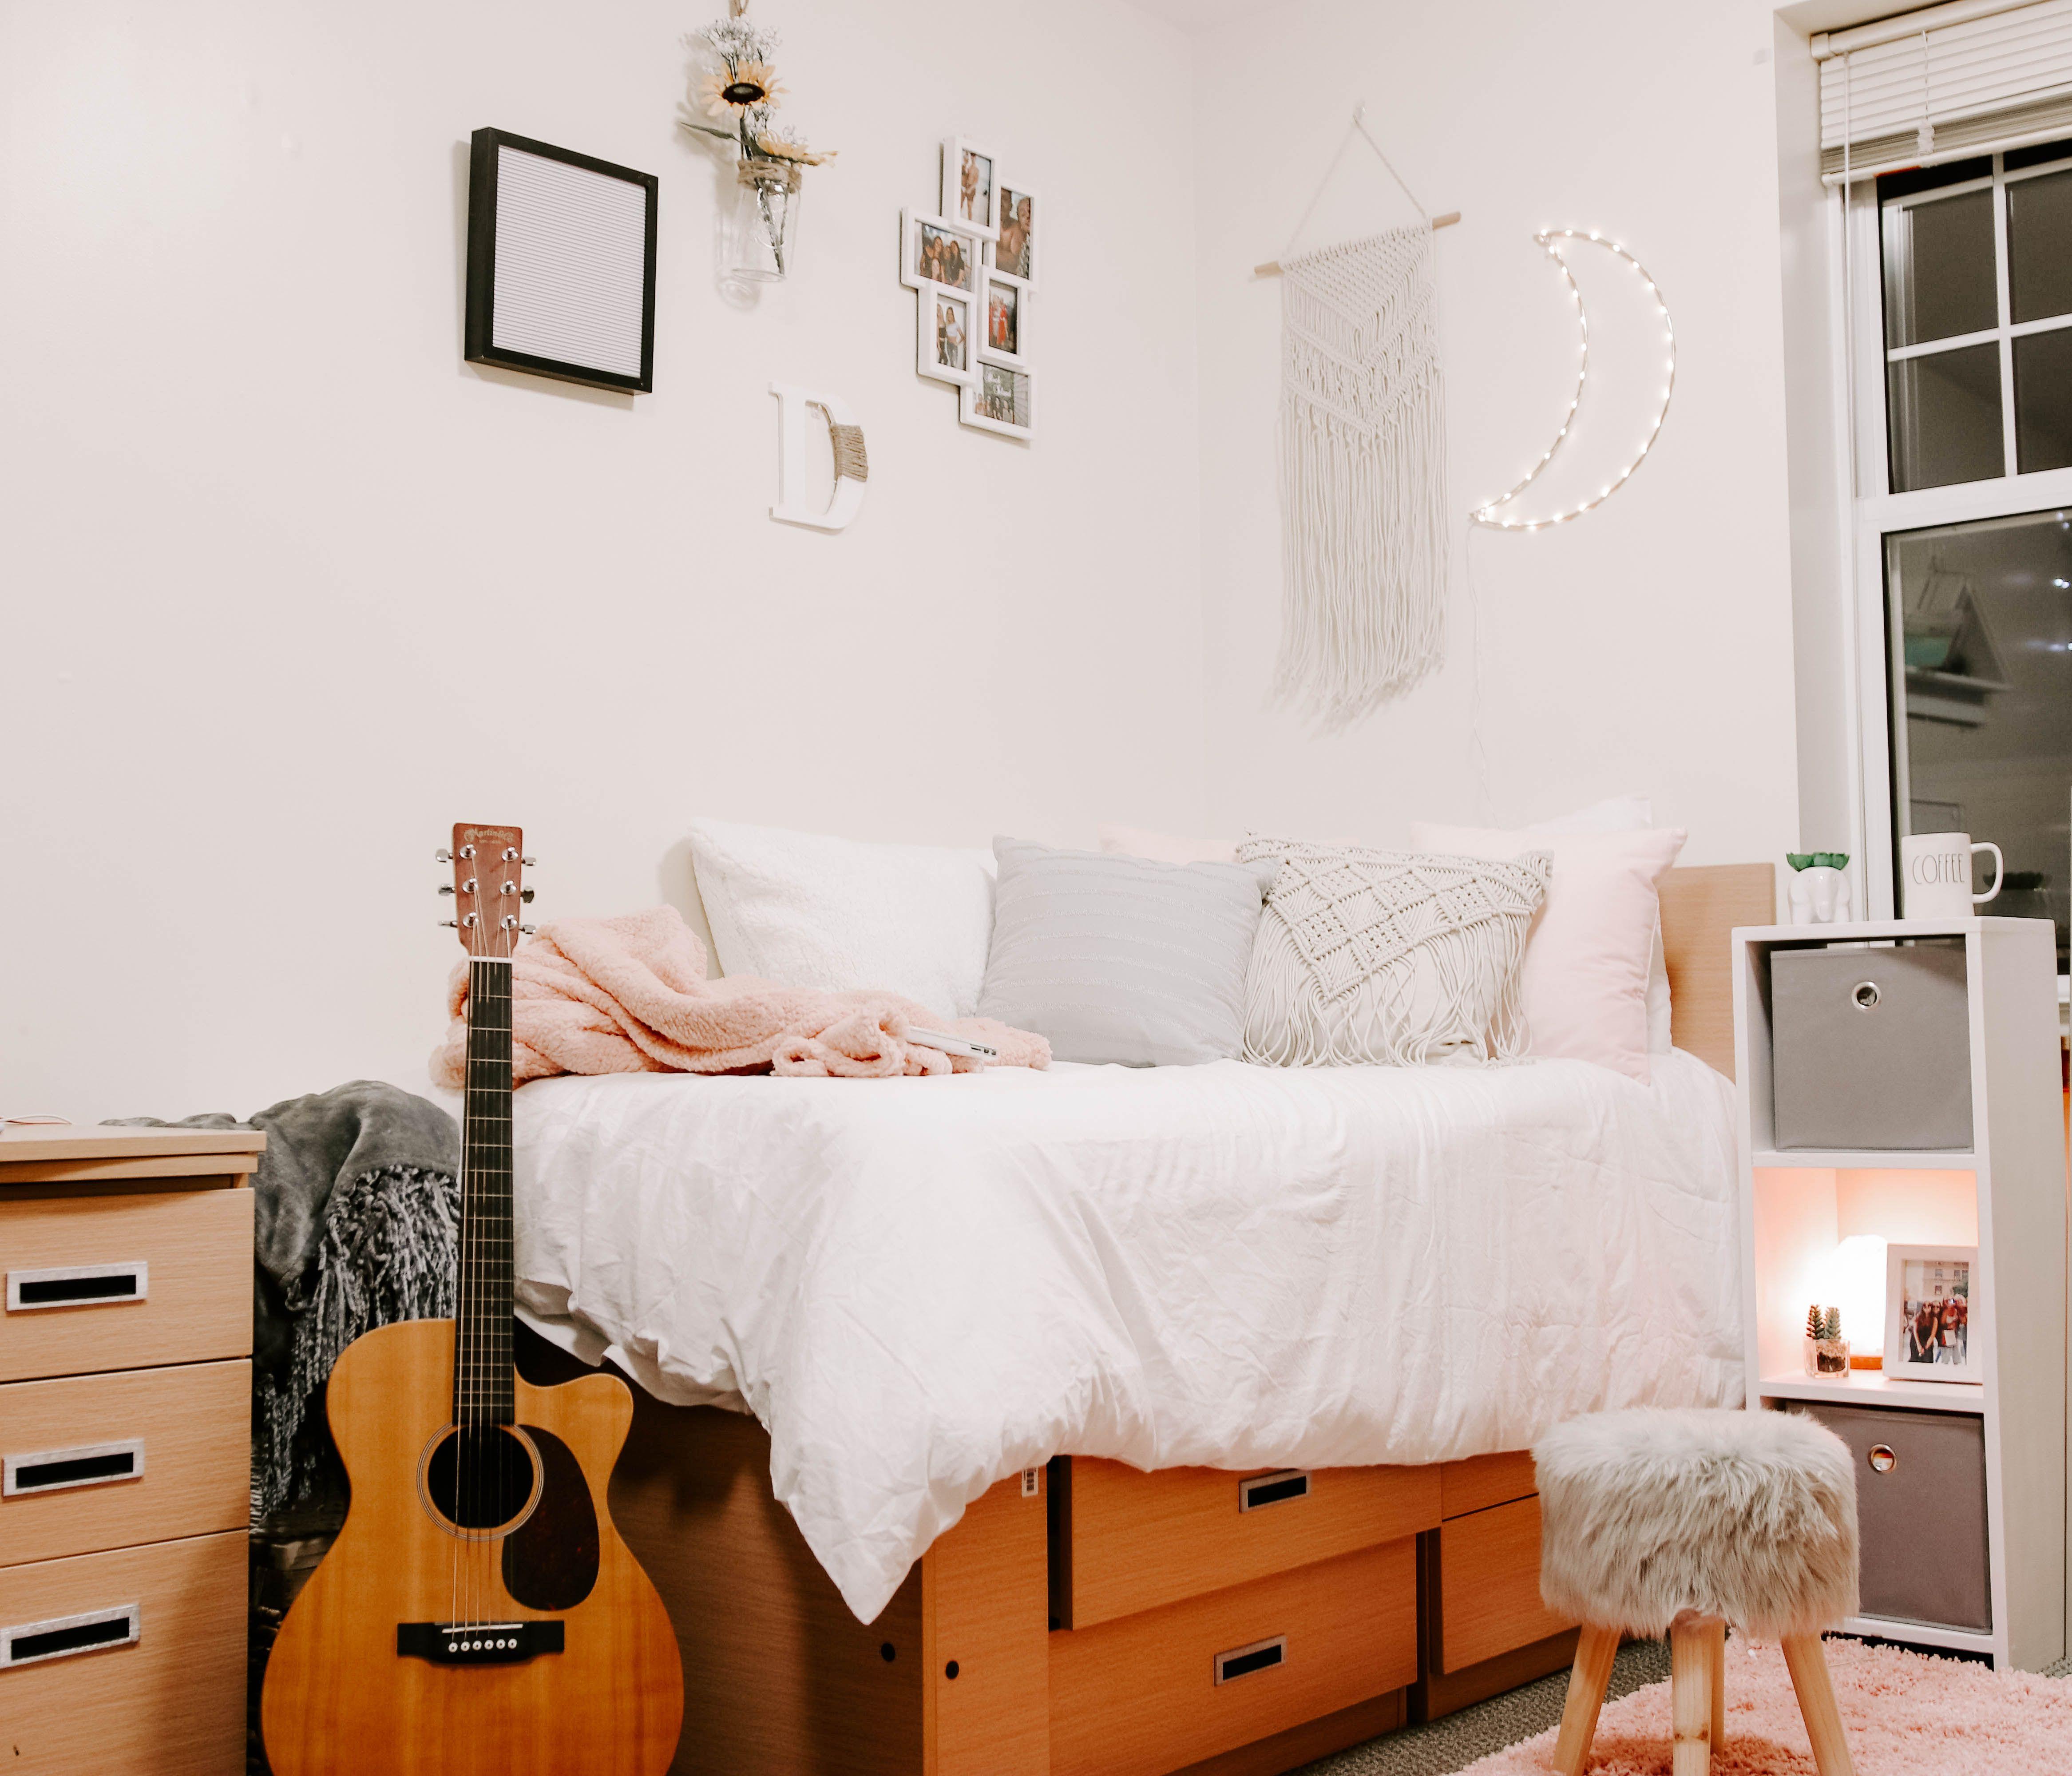 Bedroom decor Ideas   Room, Dorm, Decor